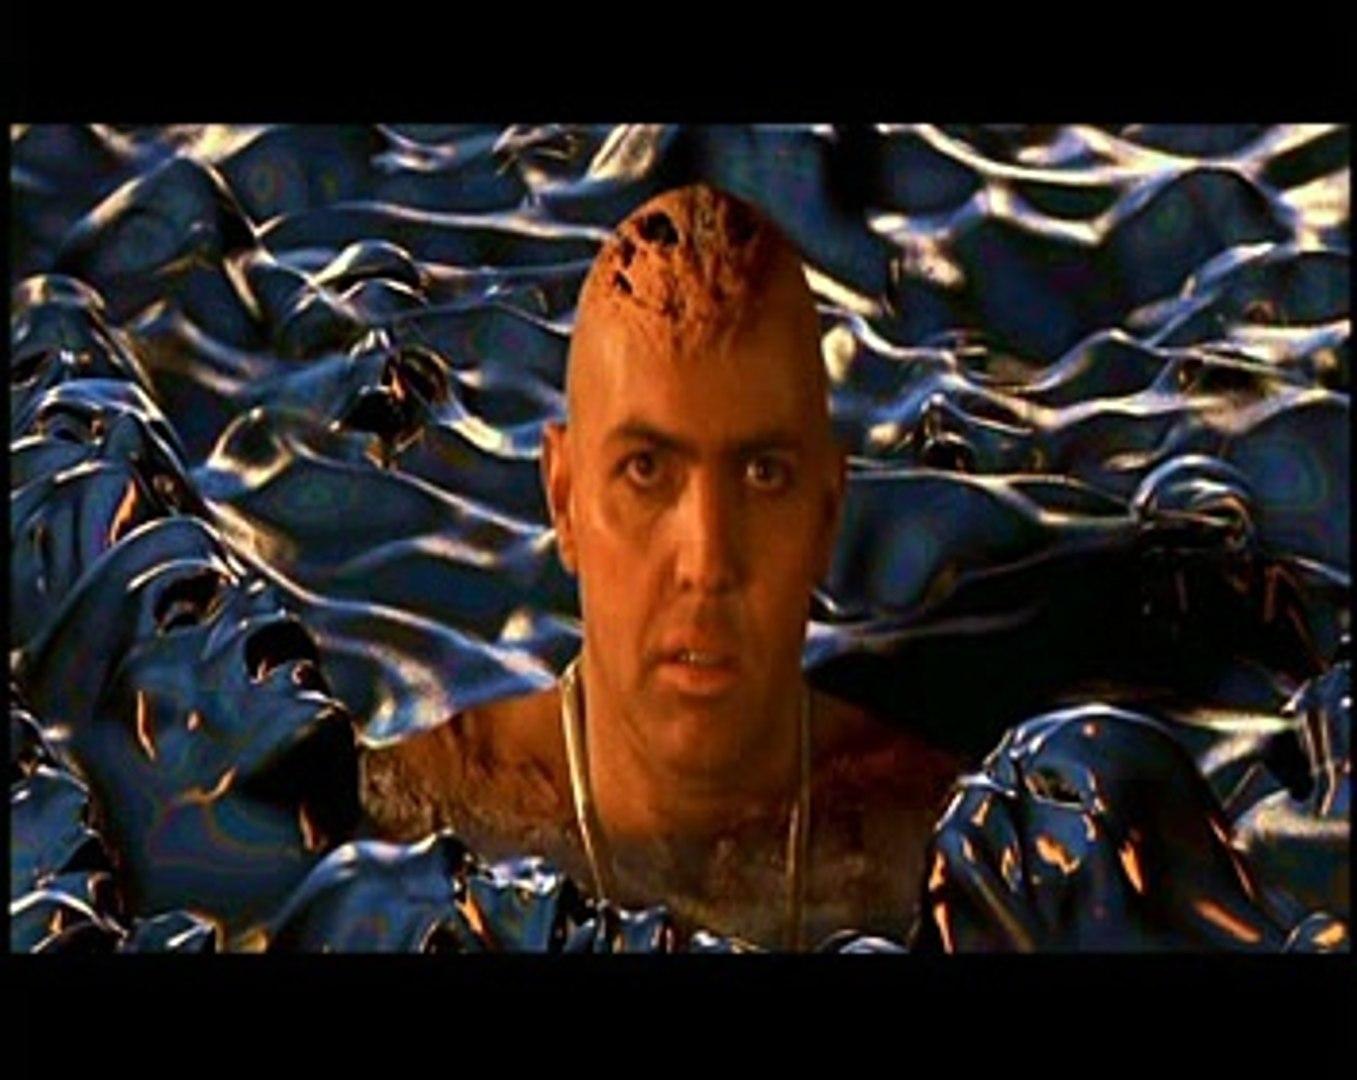 The Mummy 1999 Full Movie Online Video Dailymotion